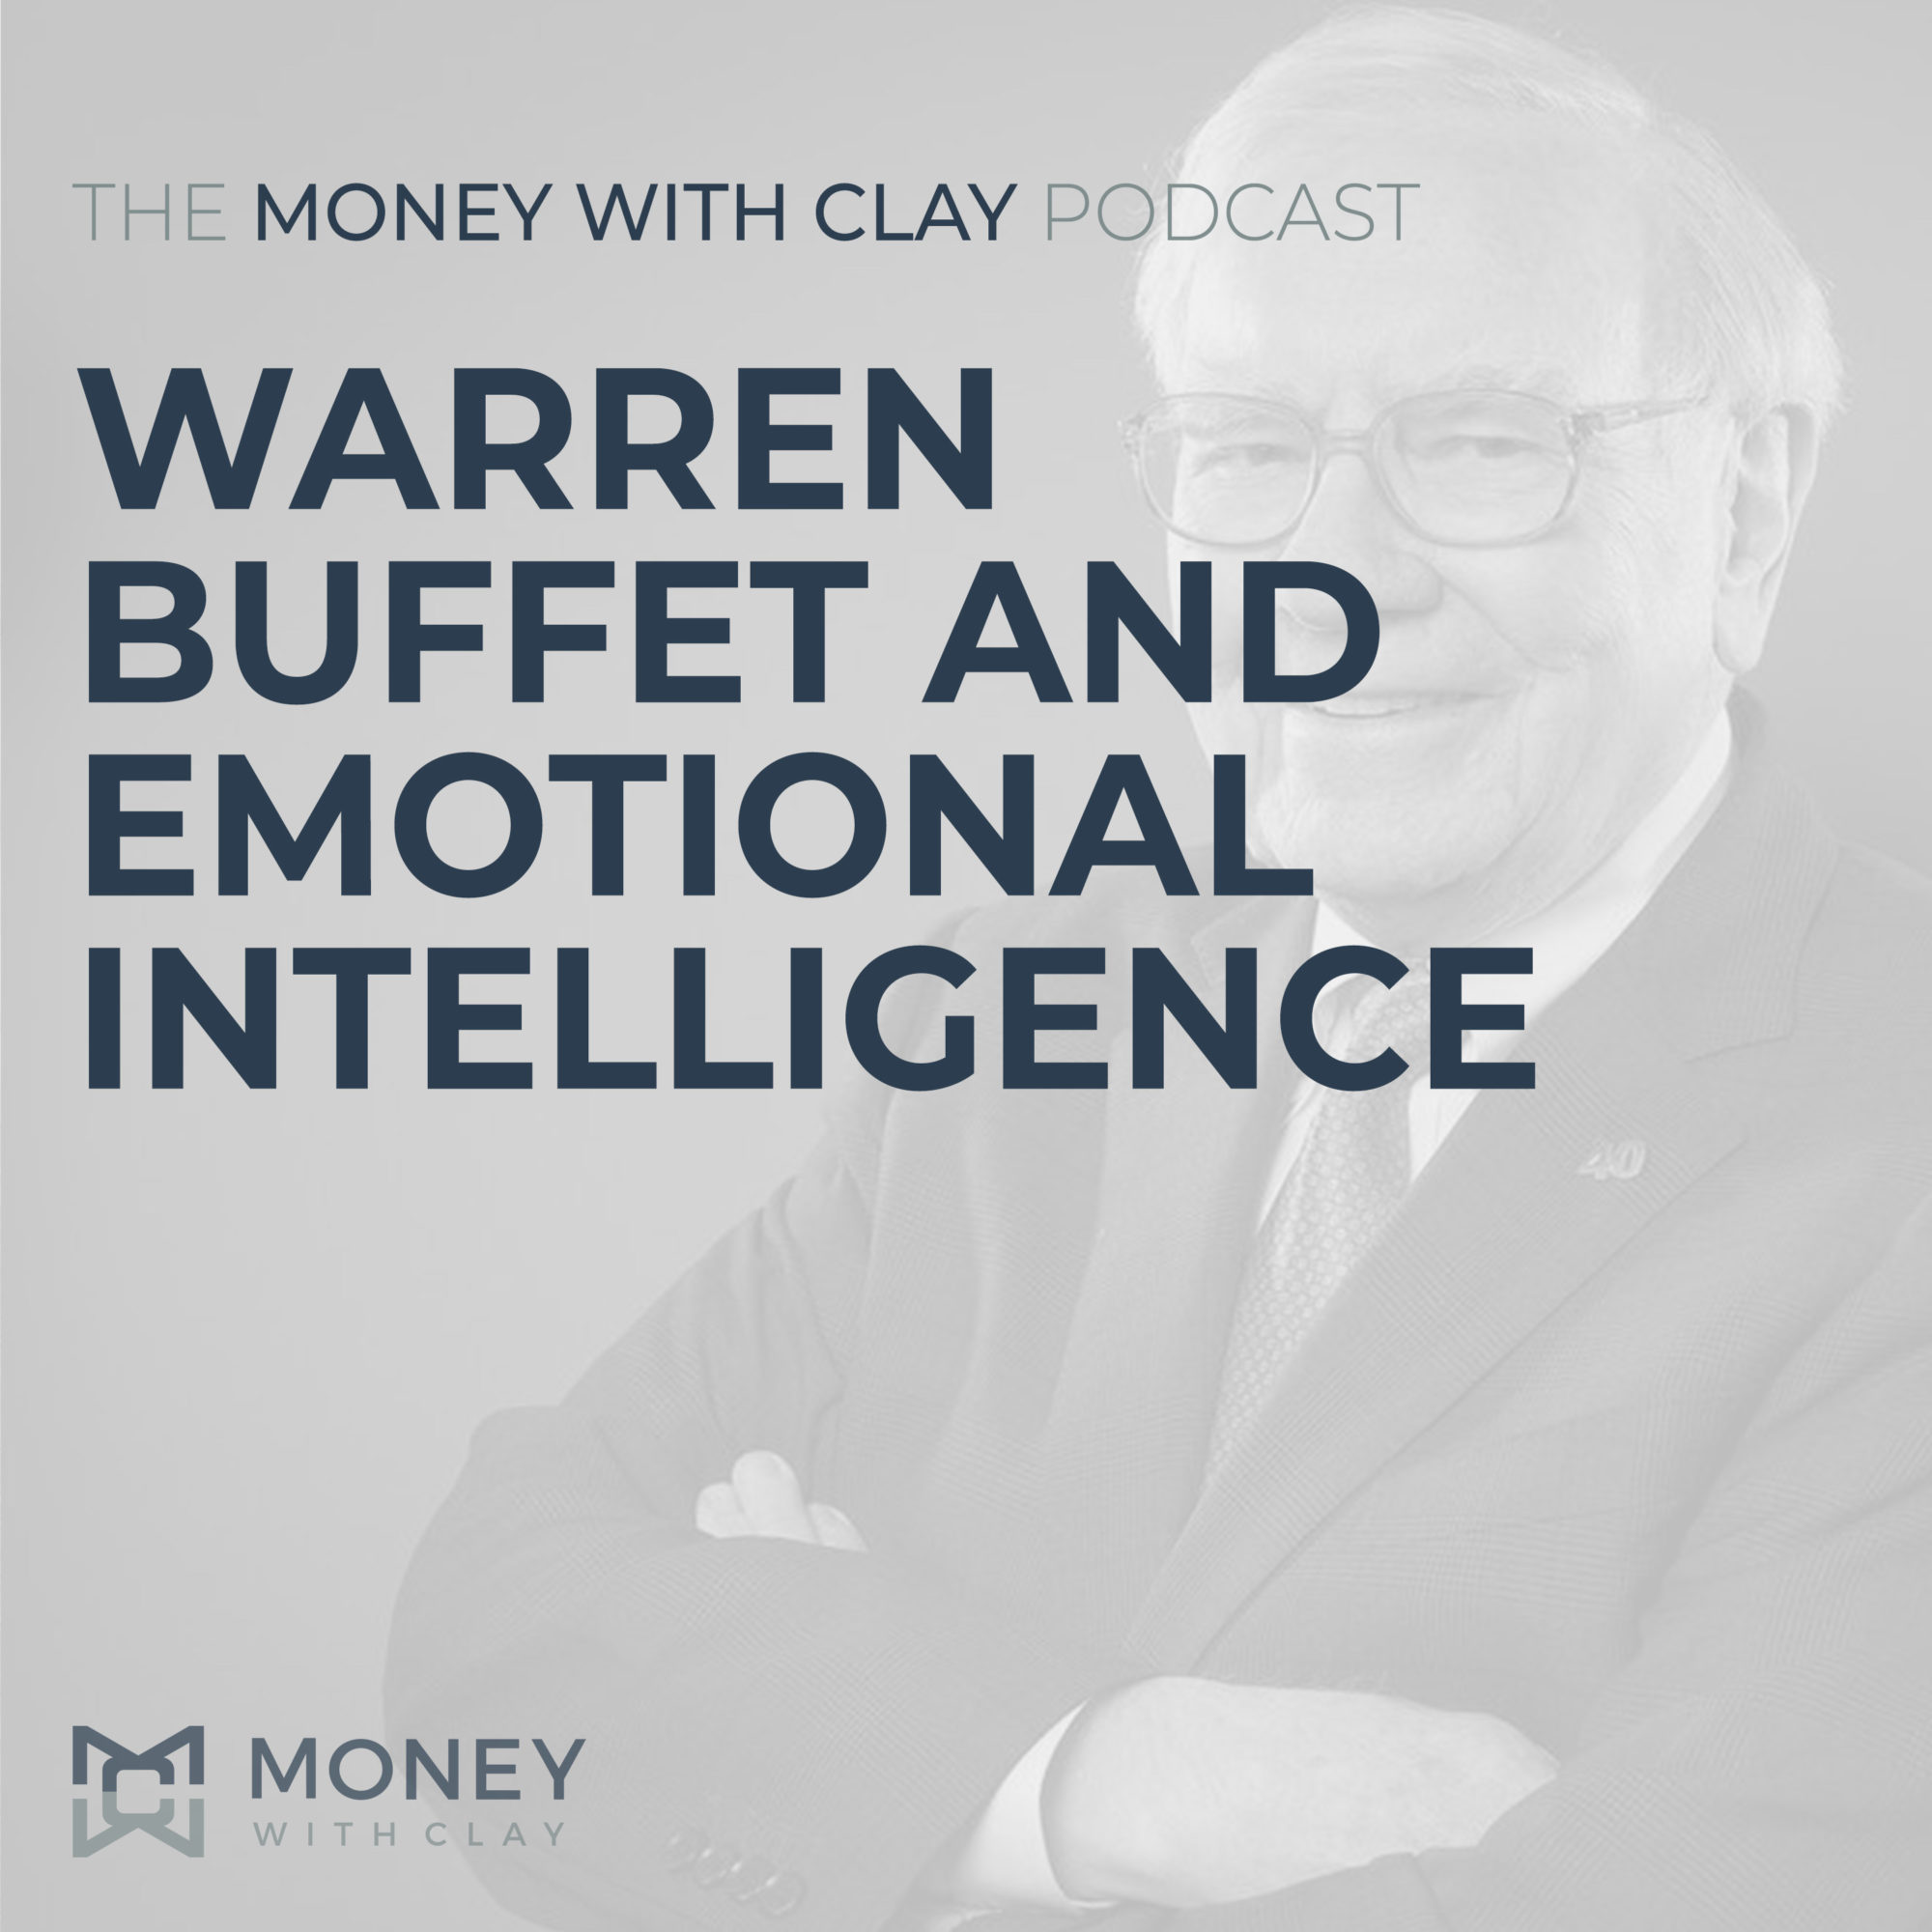 Warren Buffet and Emotional Intelligence